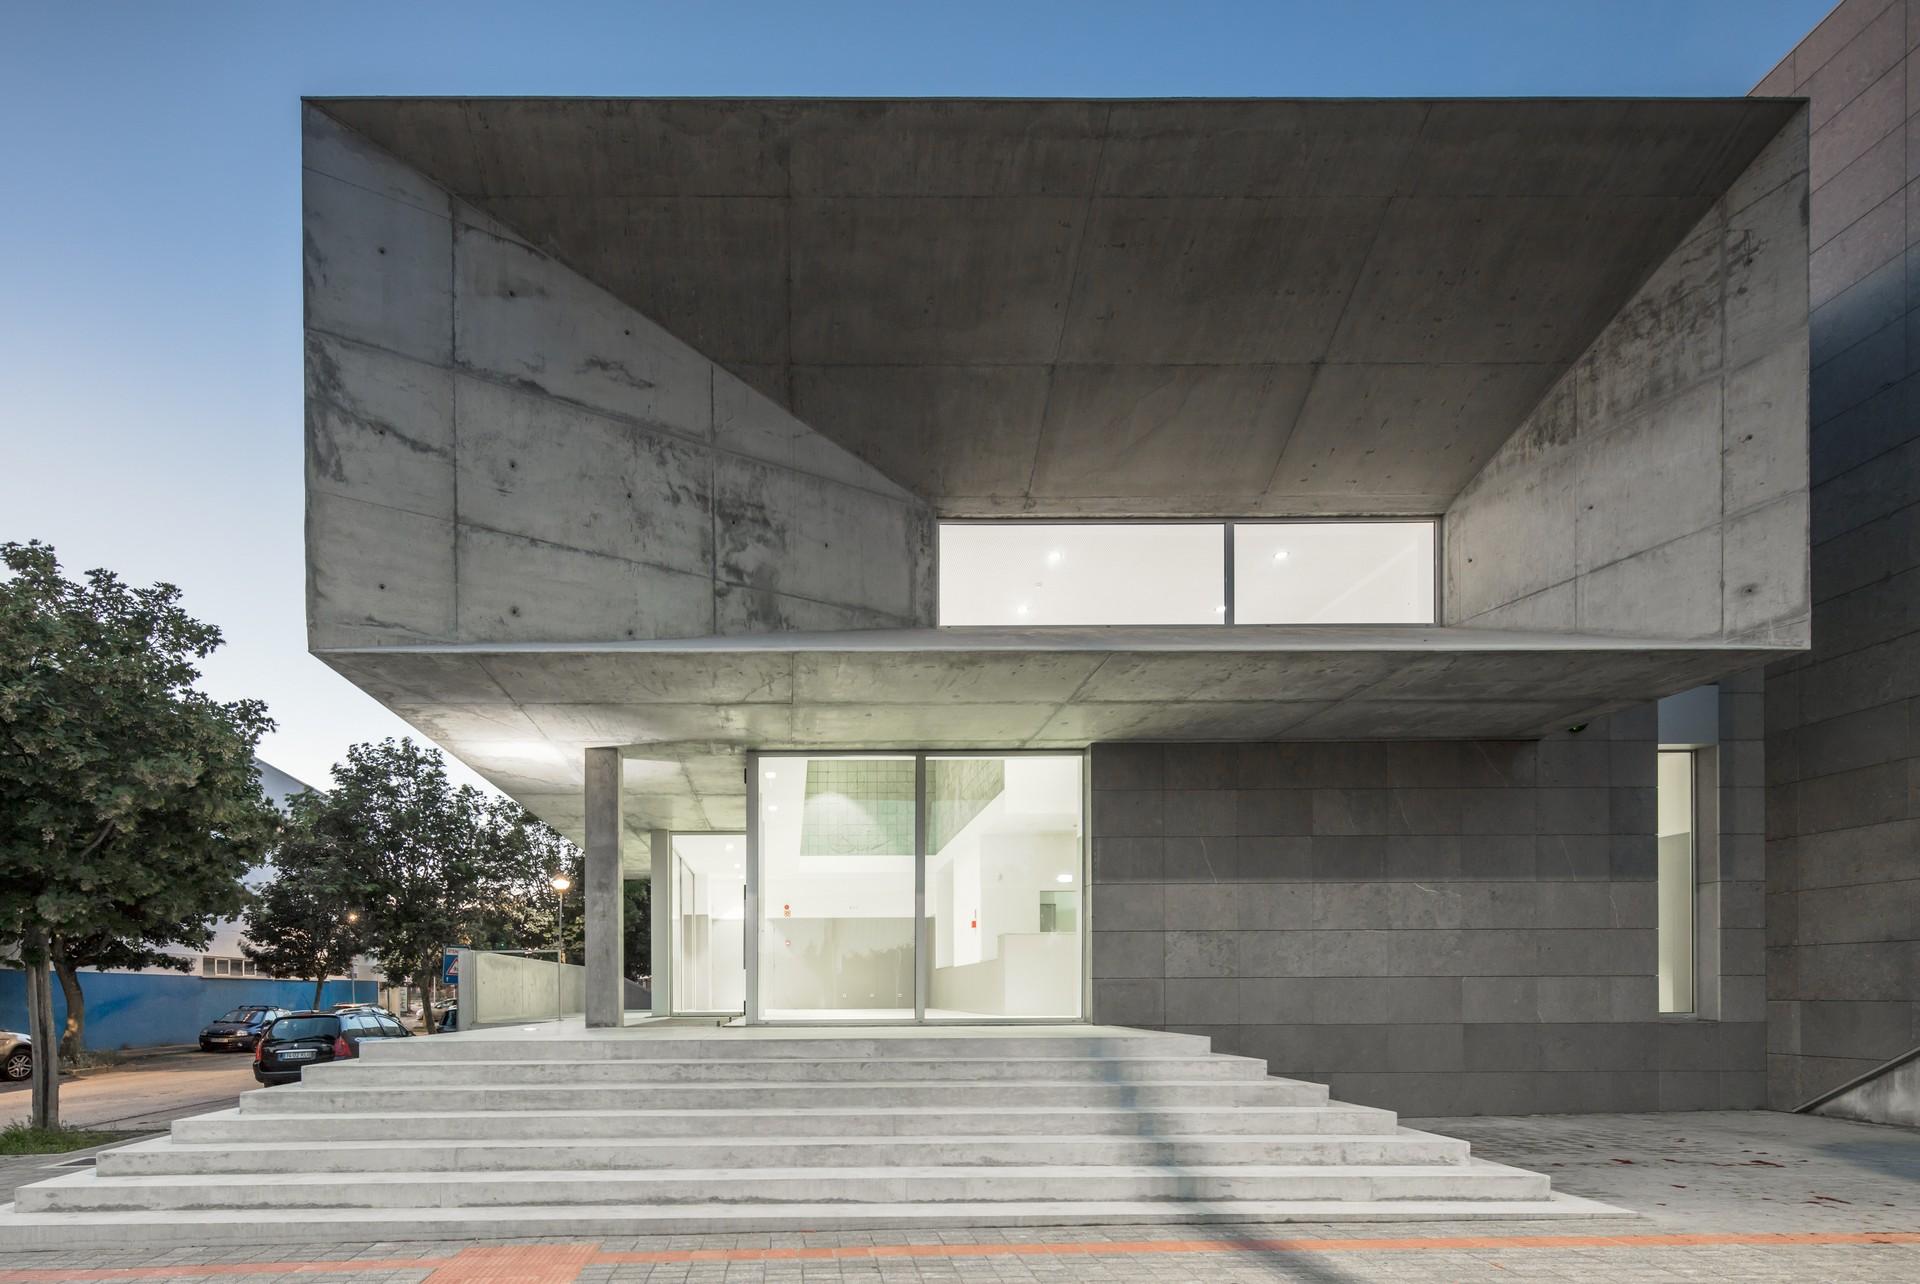 Portuguese Brutalist Architecture 3 portuguese brutalist architecture Portuguese Brutalist Architecture is presented in Atlantic Pavilion Portuguese Brutalist Architecture 3